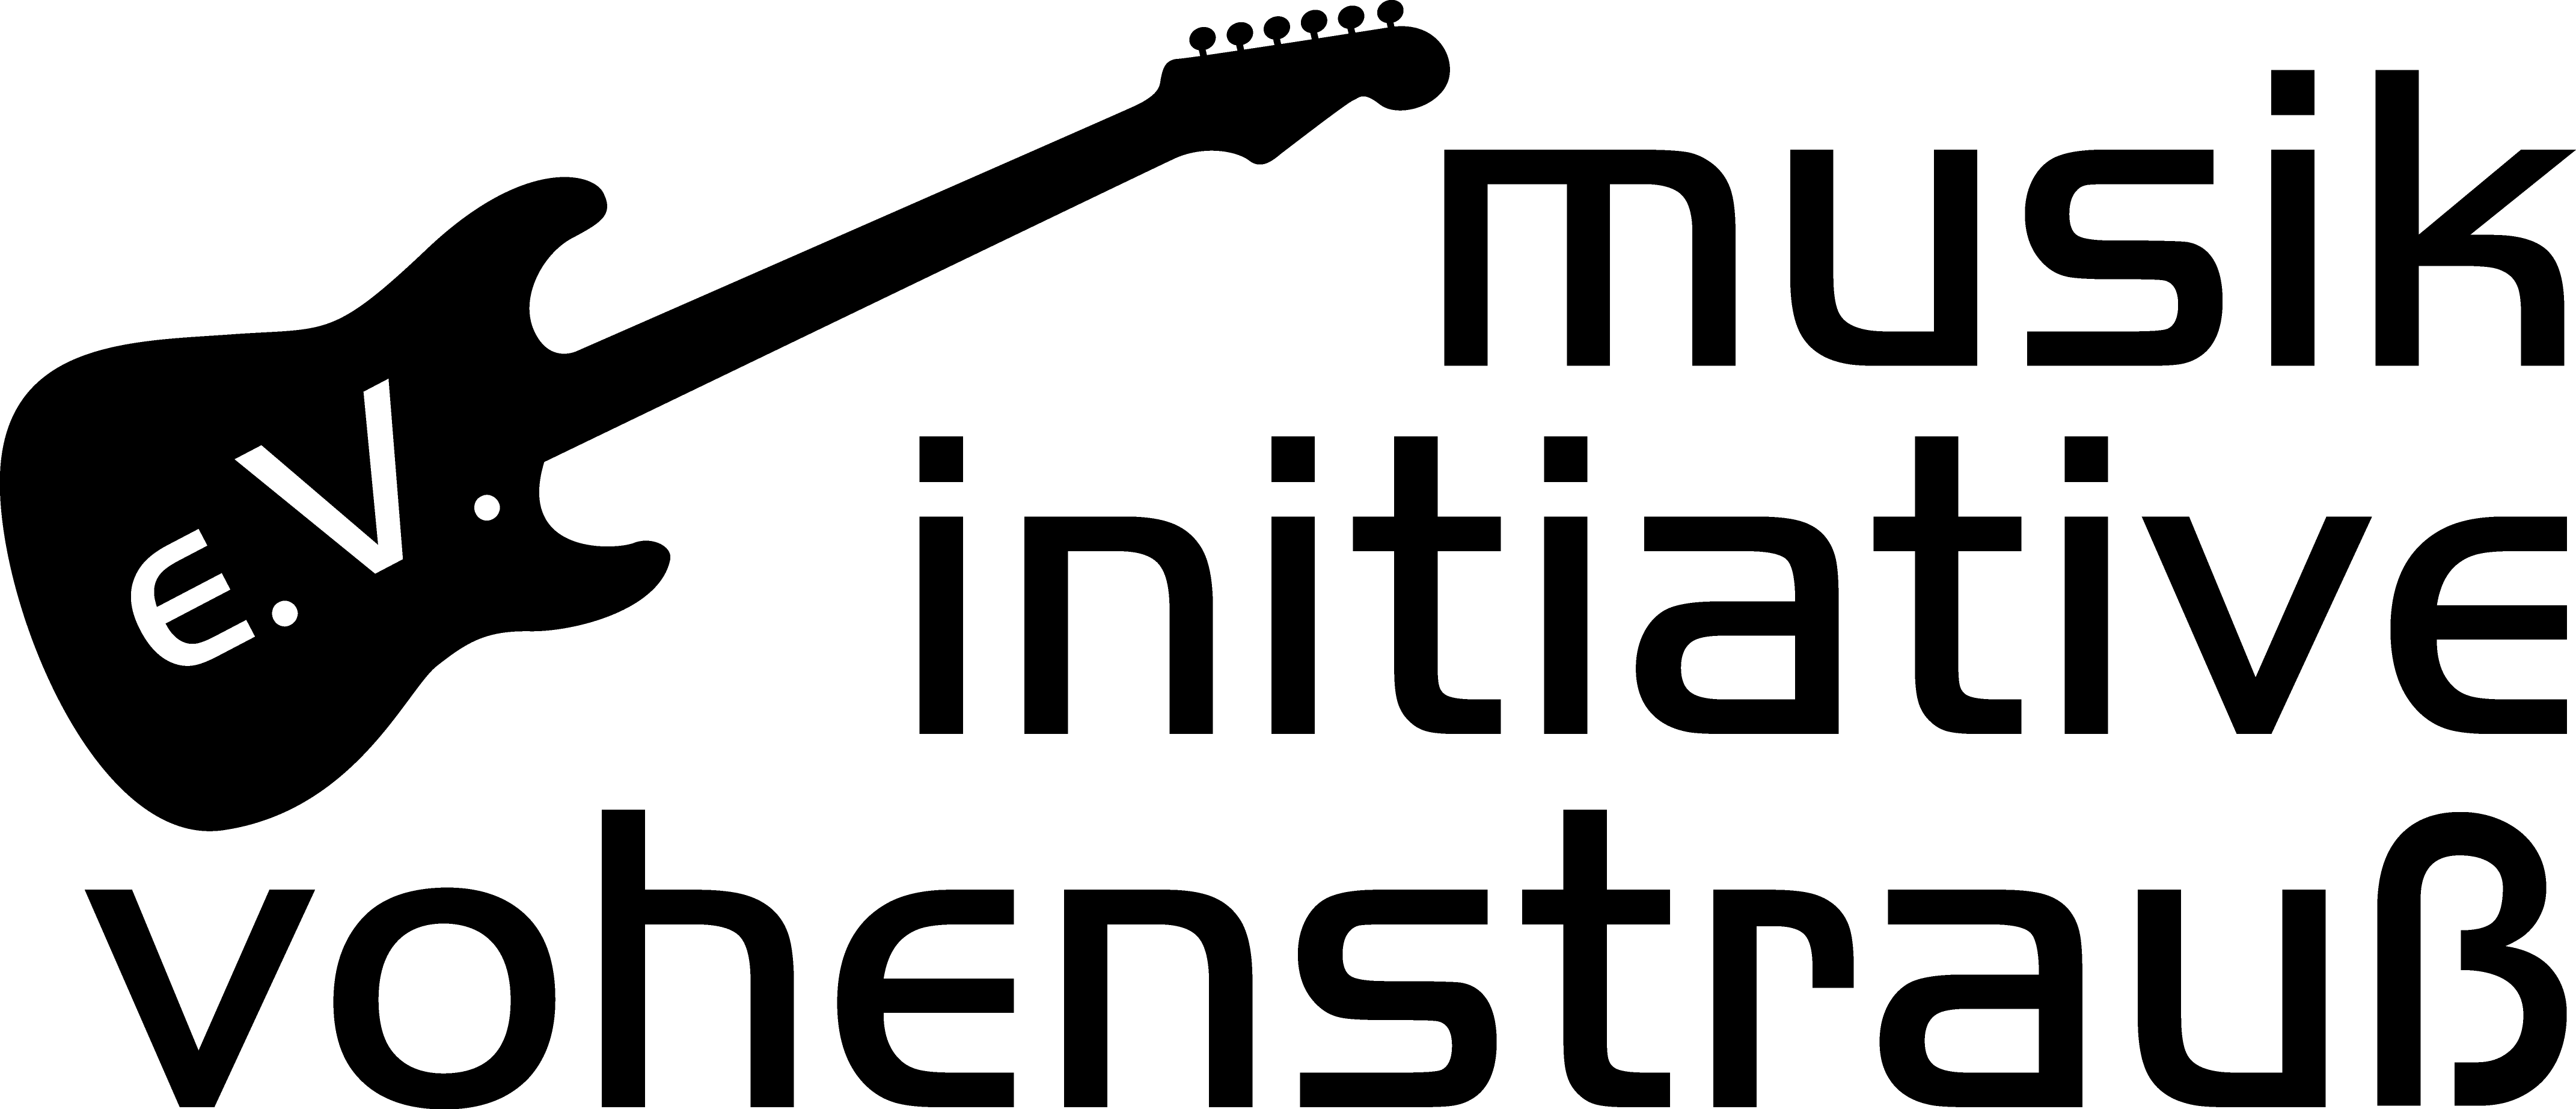 mivoh-logo-black